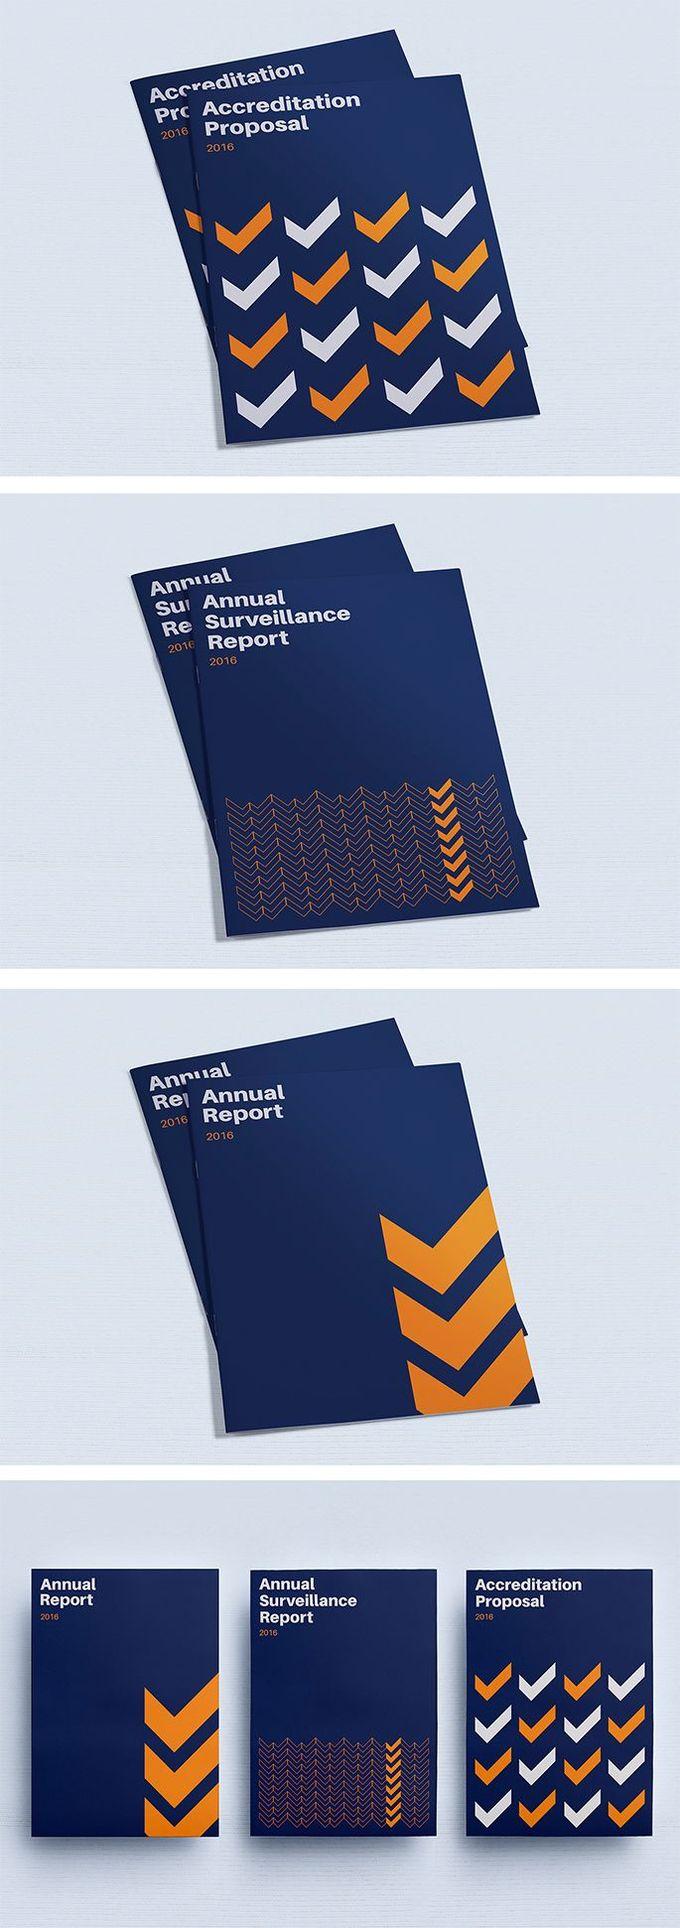 Brochure cover design inspiration, Geometric minimalist layout research, blue and orange   Annual Report, Company Profile, Proposal, Report   Celine Le Duigou, Freelance Graphic & Web Designer